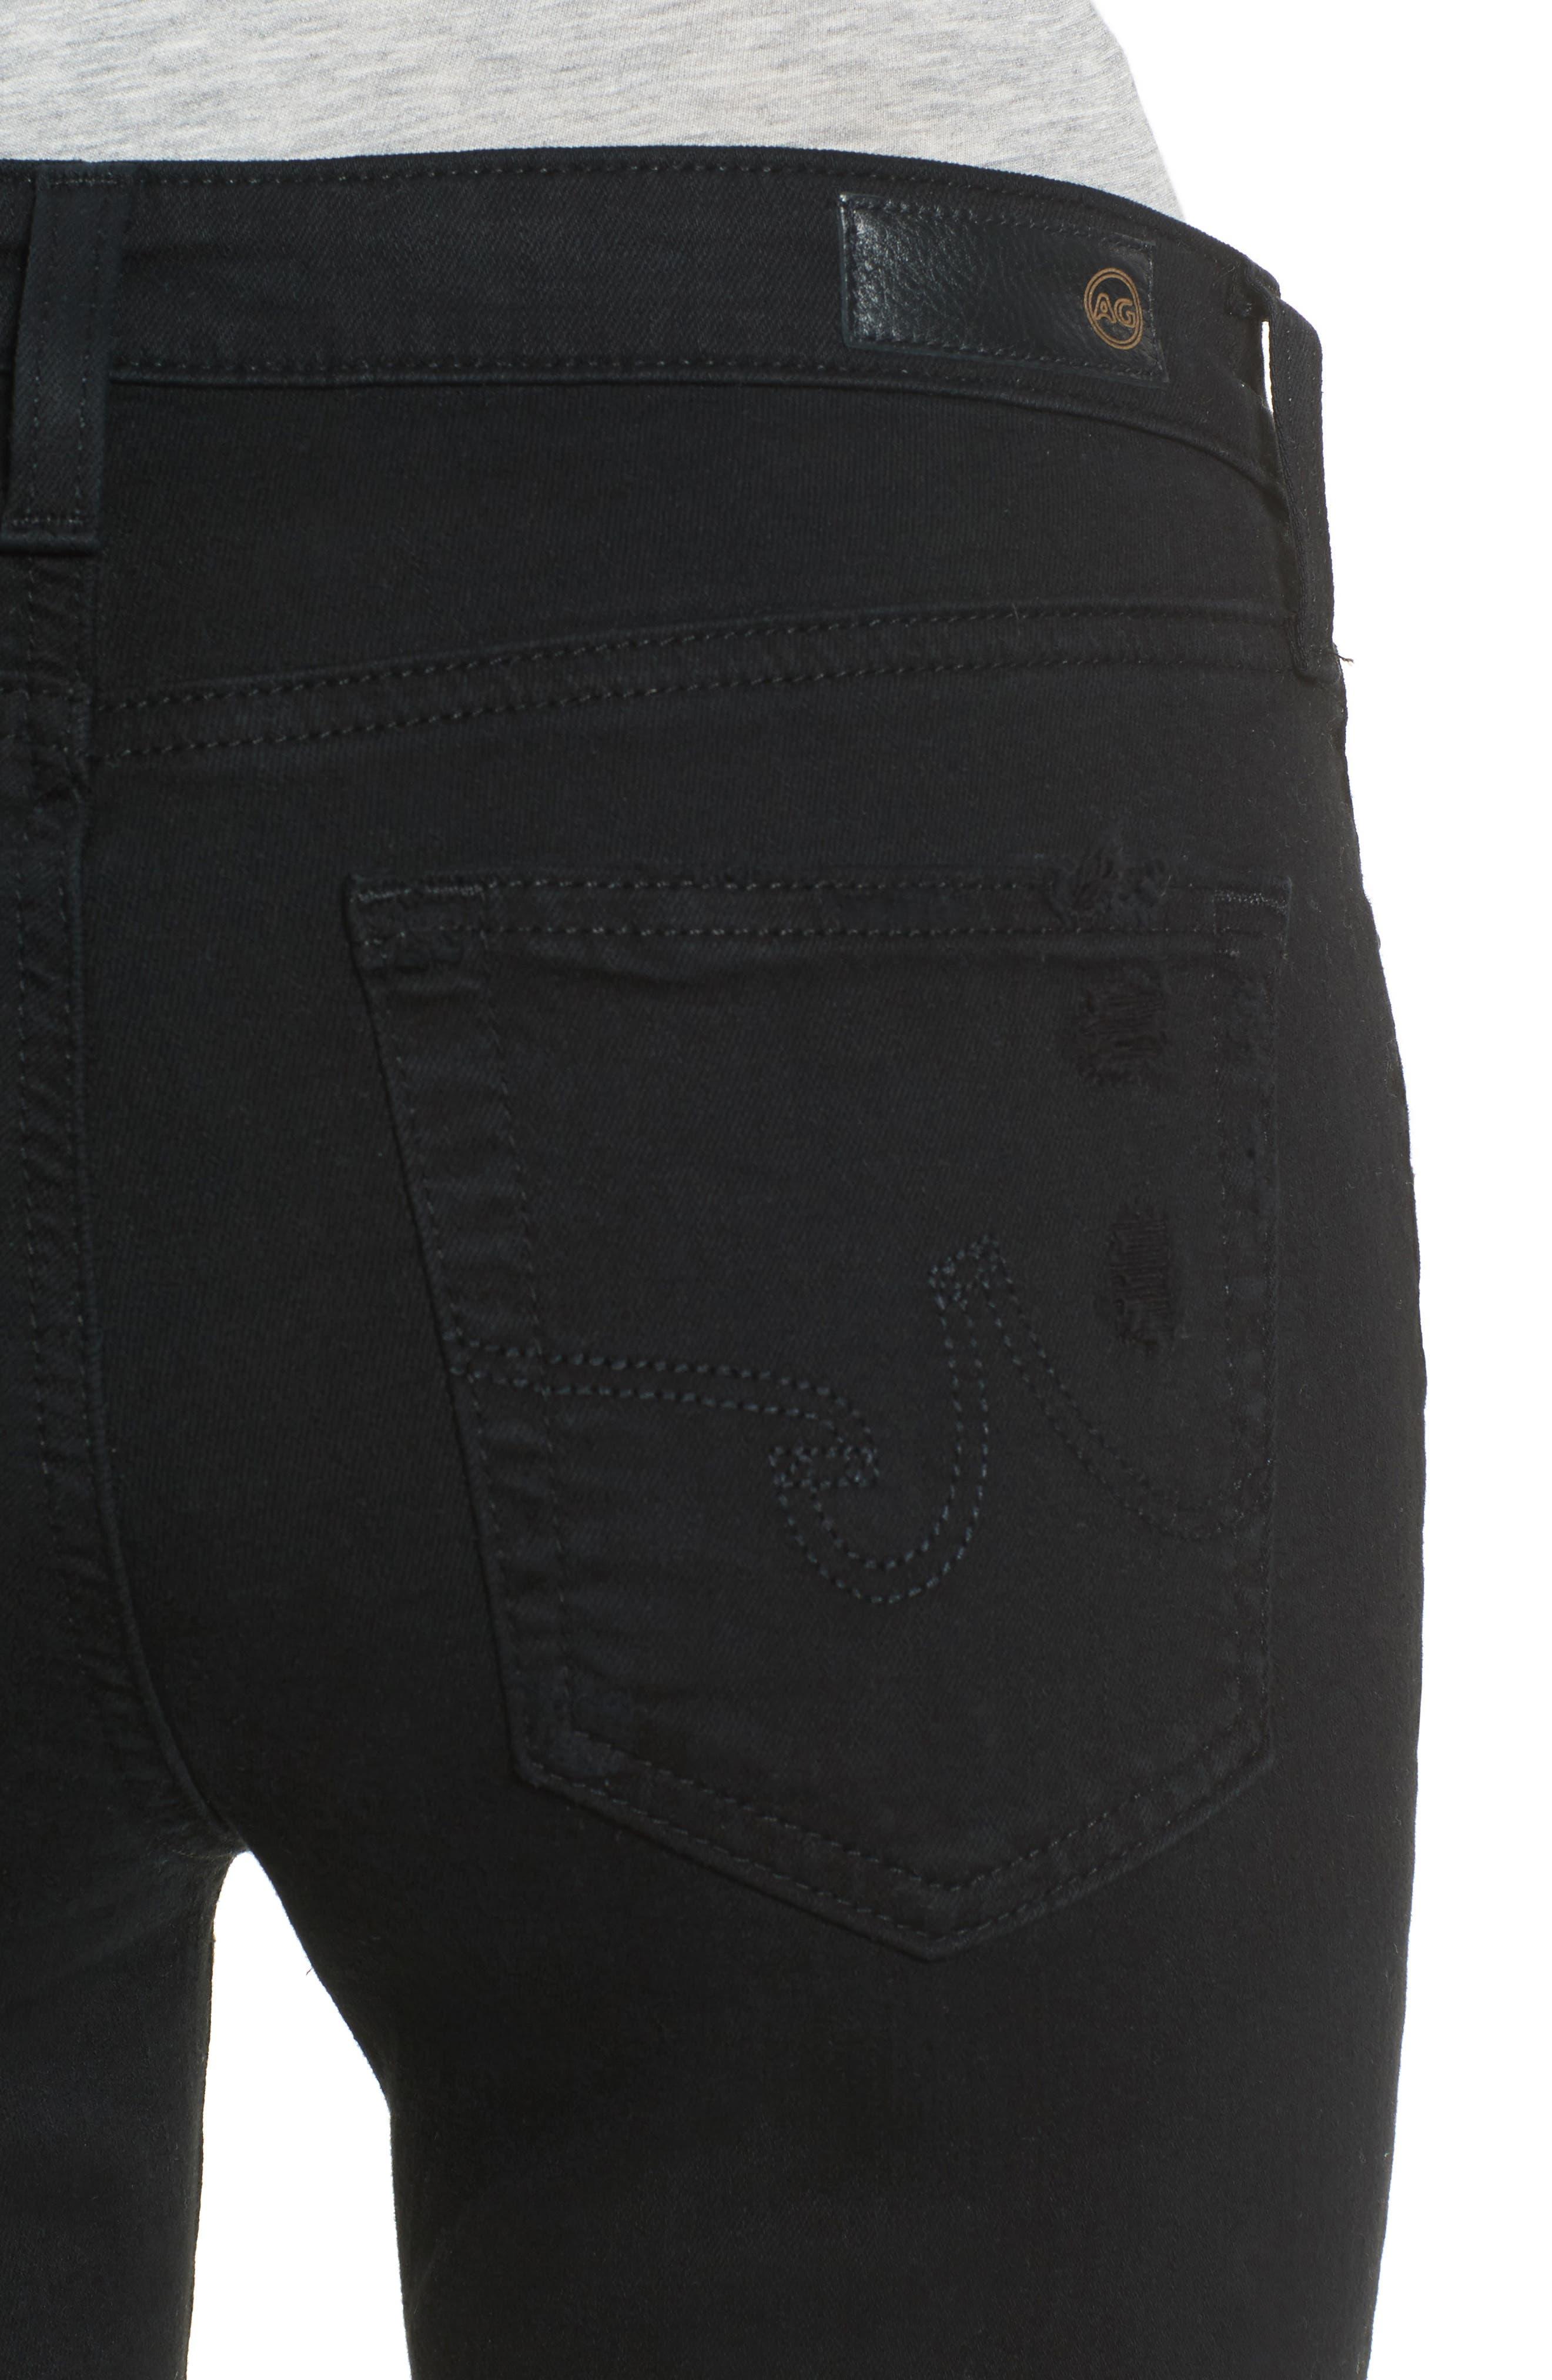 Prima Mid Rise Cigarette Jeans,                             Alternate thumbnail 4, color,                             5 YEARS BLACK DESTRUCTED